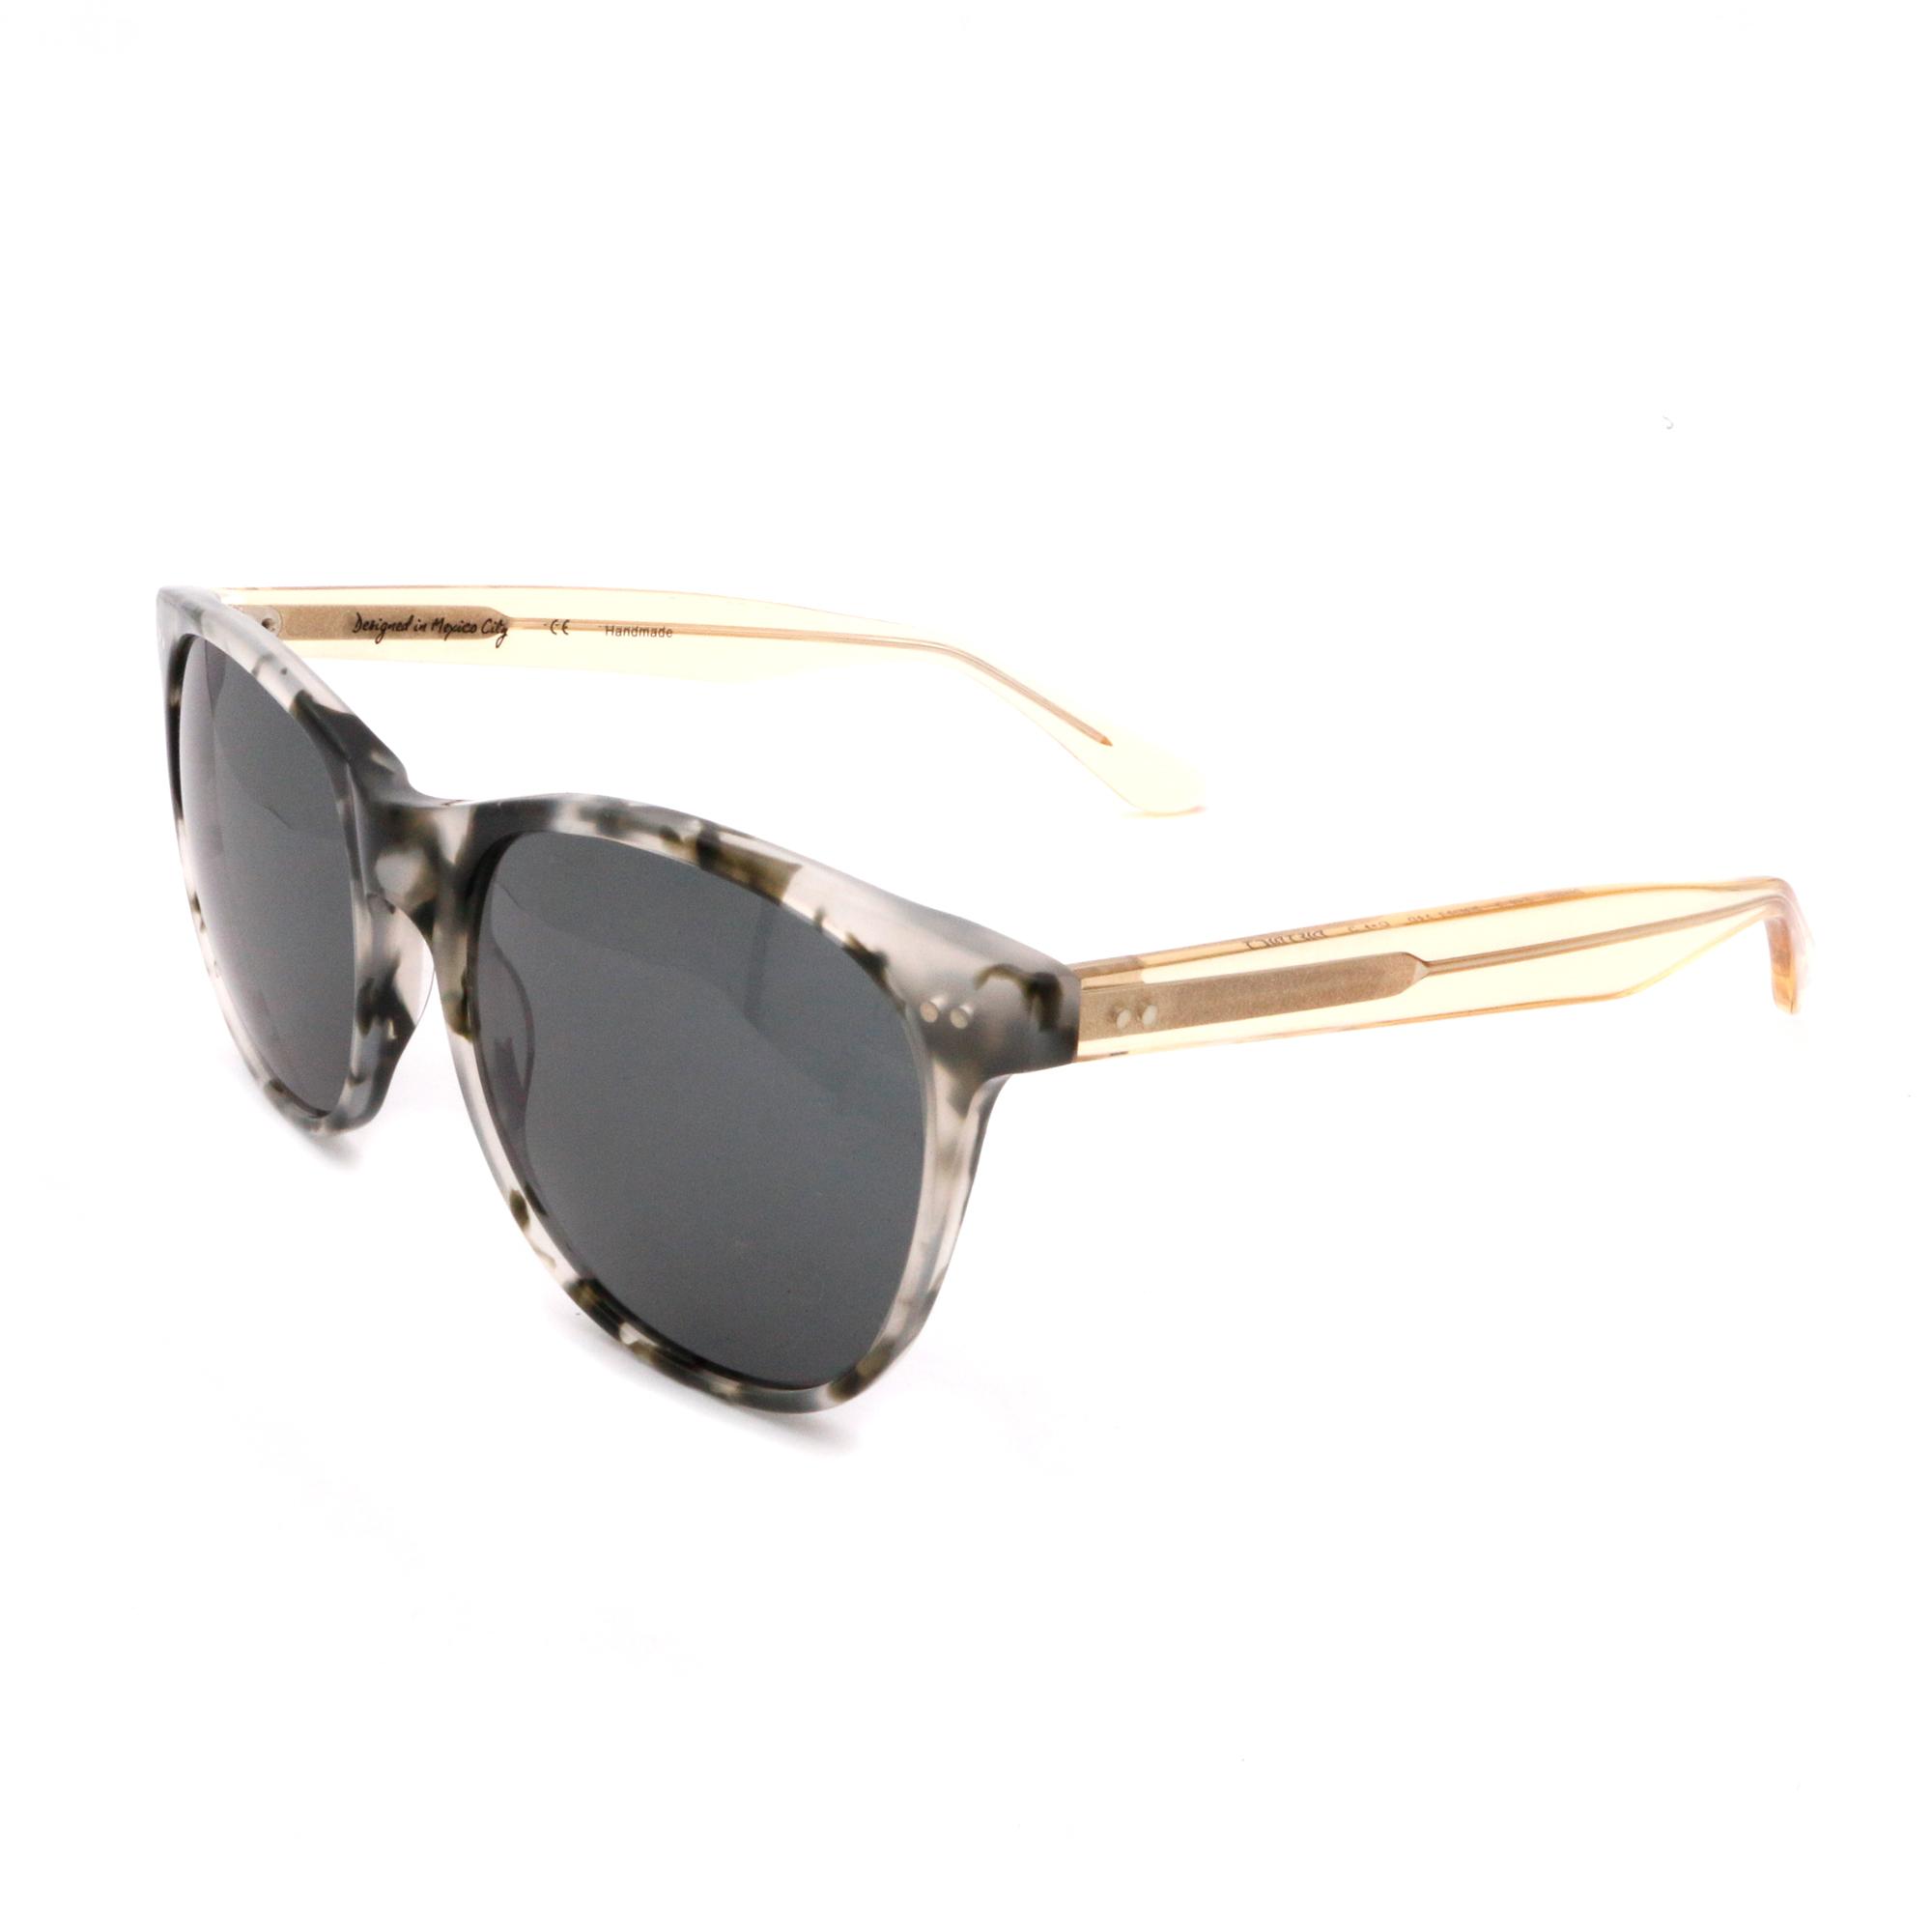 but debate what great make it eyewear jaguar uk recession the through shape will in